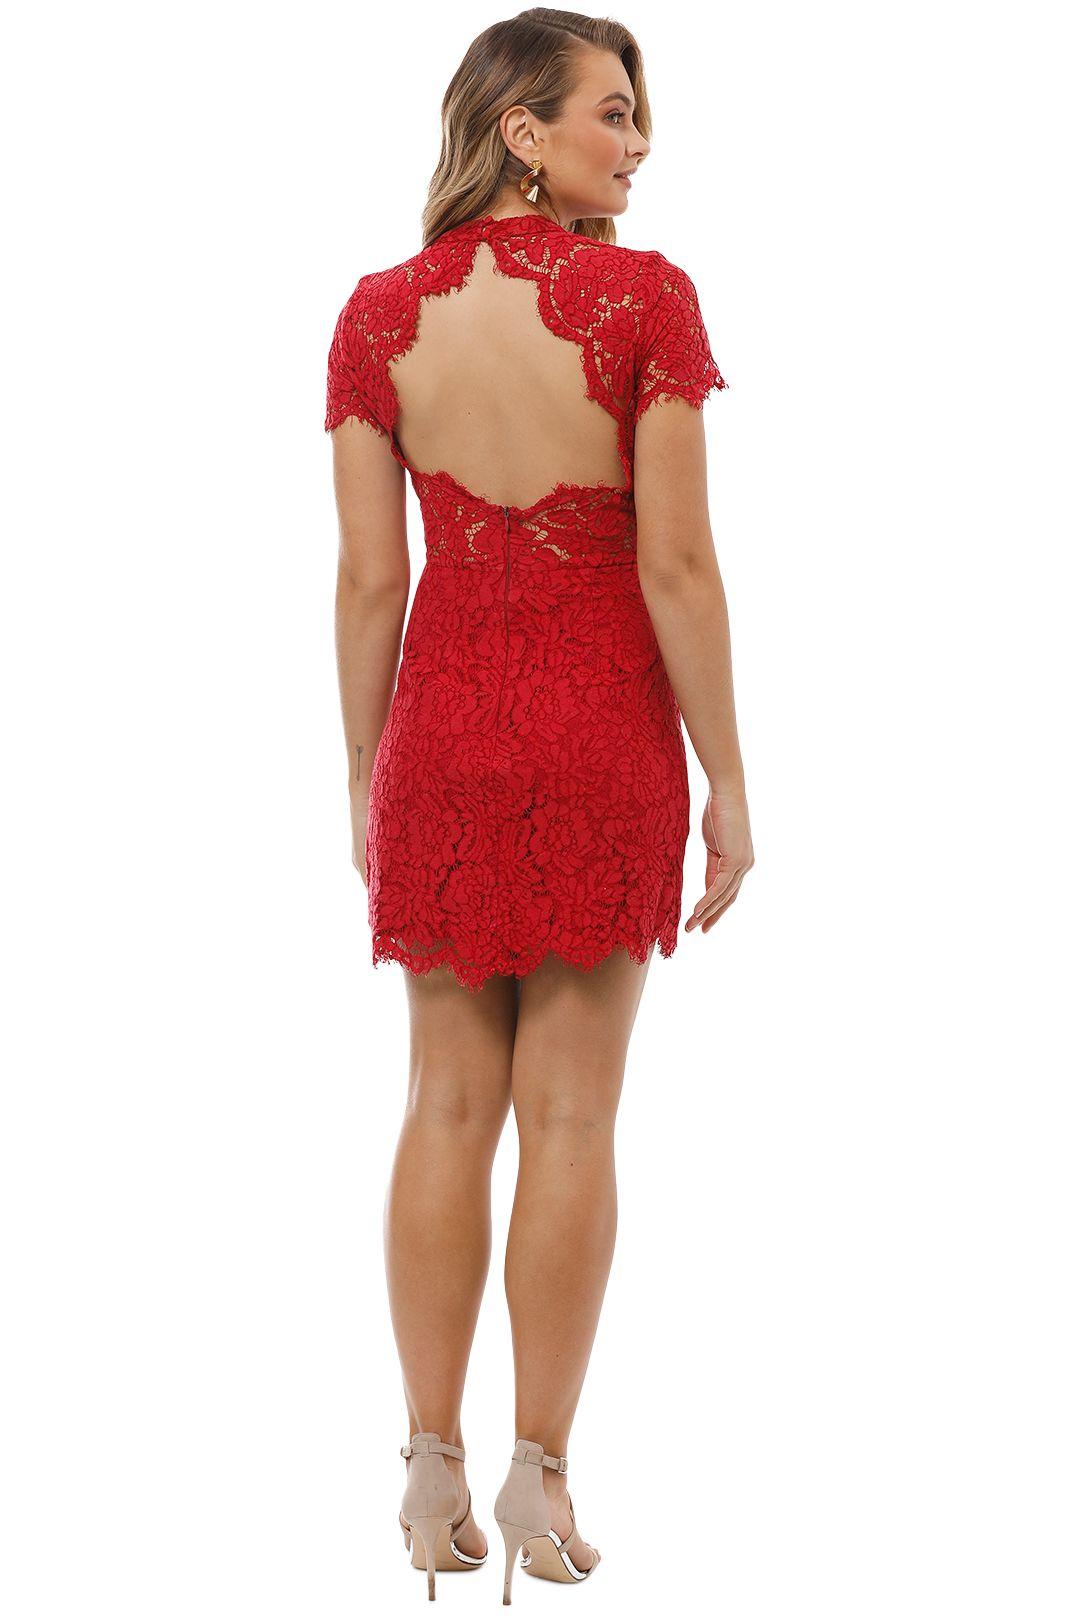 Maison Vivienne - Bitter Sweet High Neck Mini Dress - Red - Back